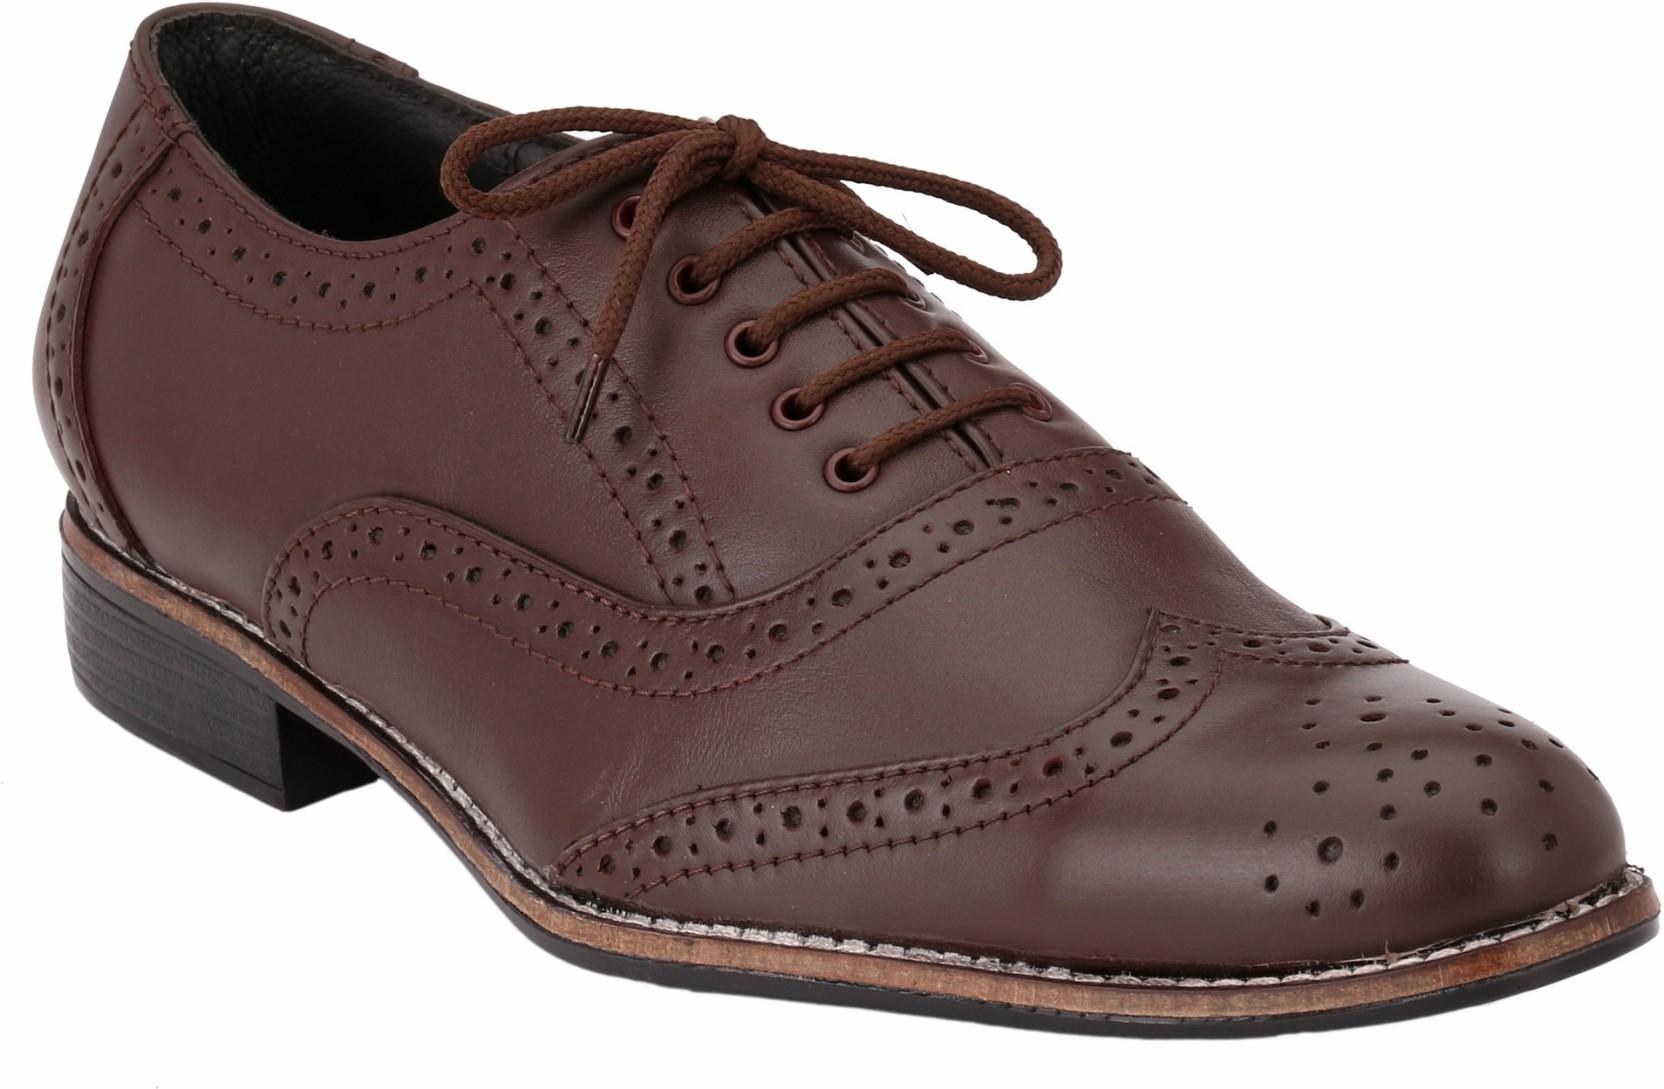 brooks formal sko low cost d168d 39b64